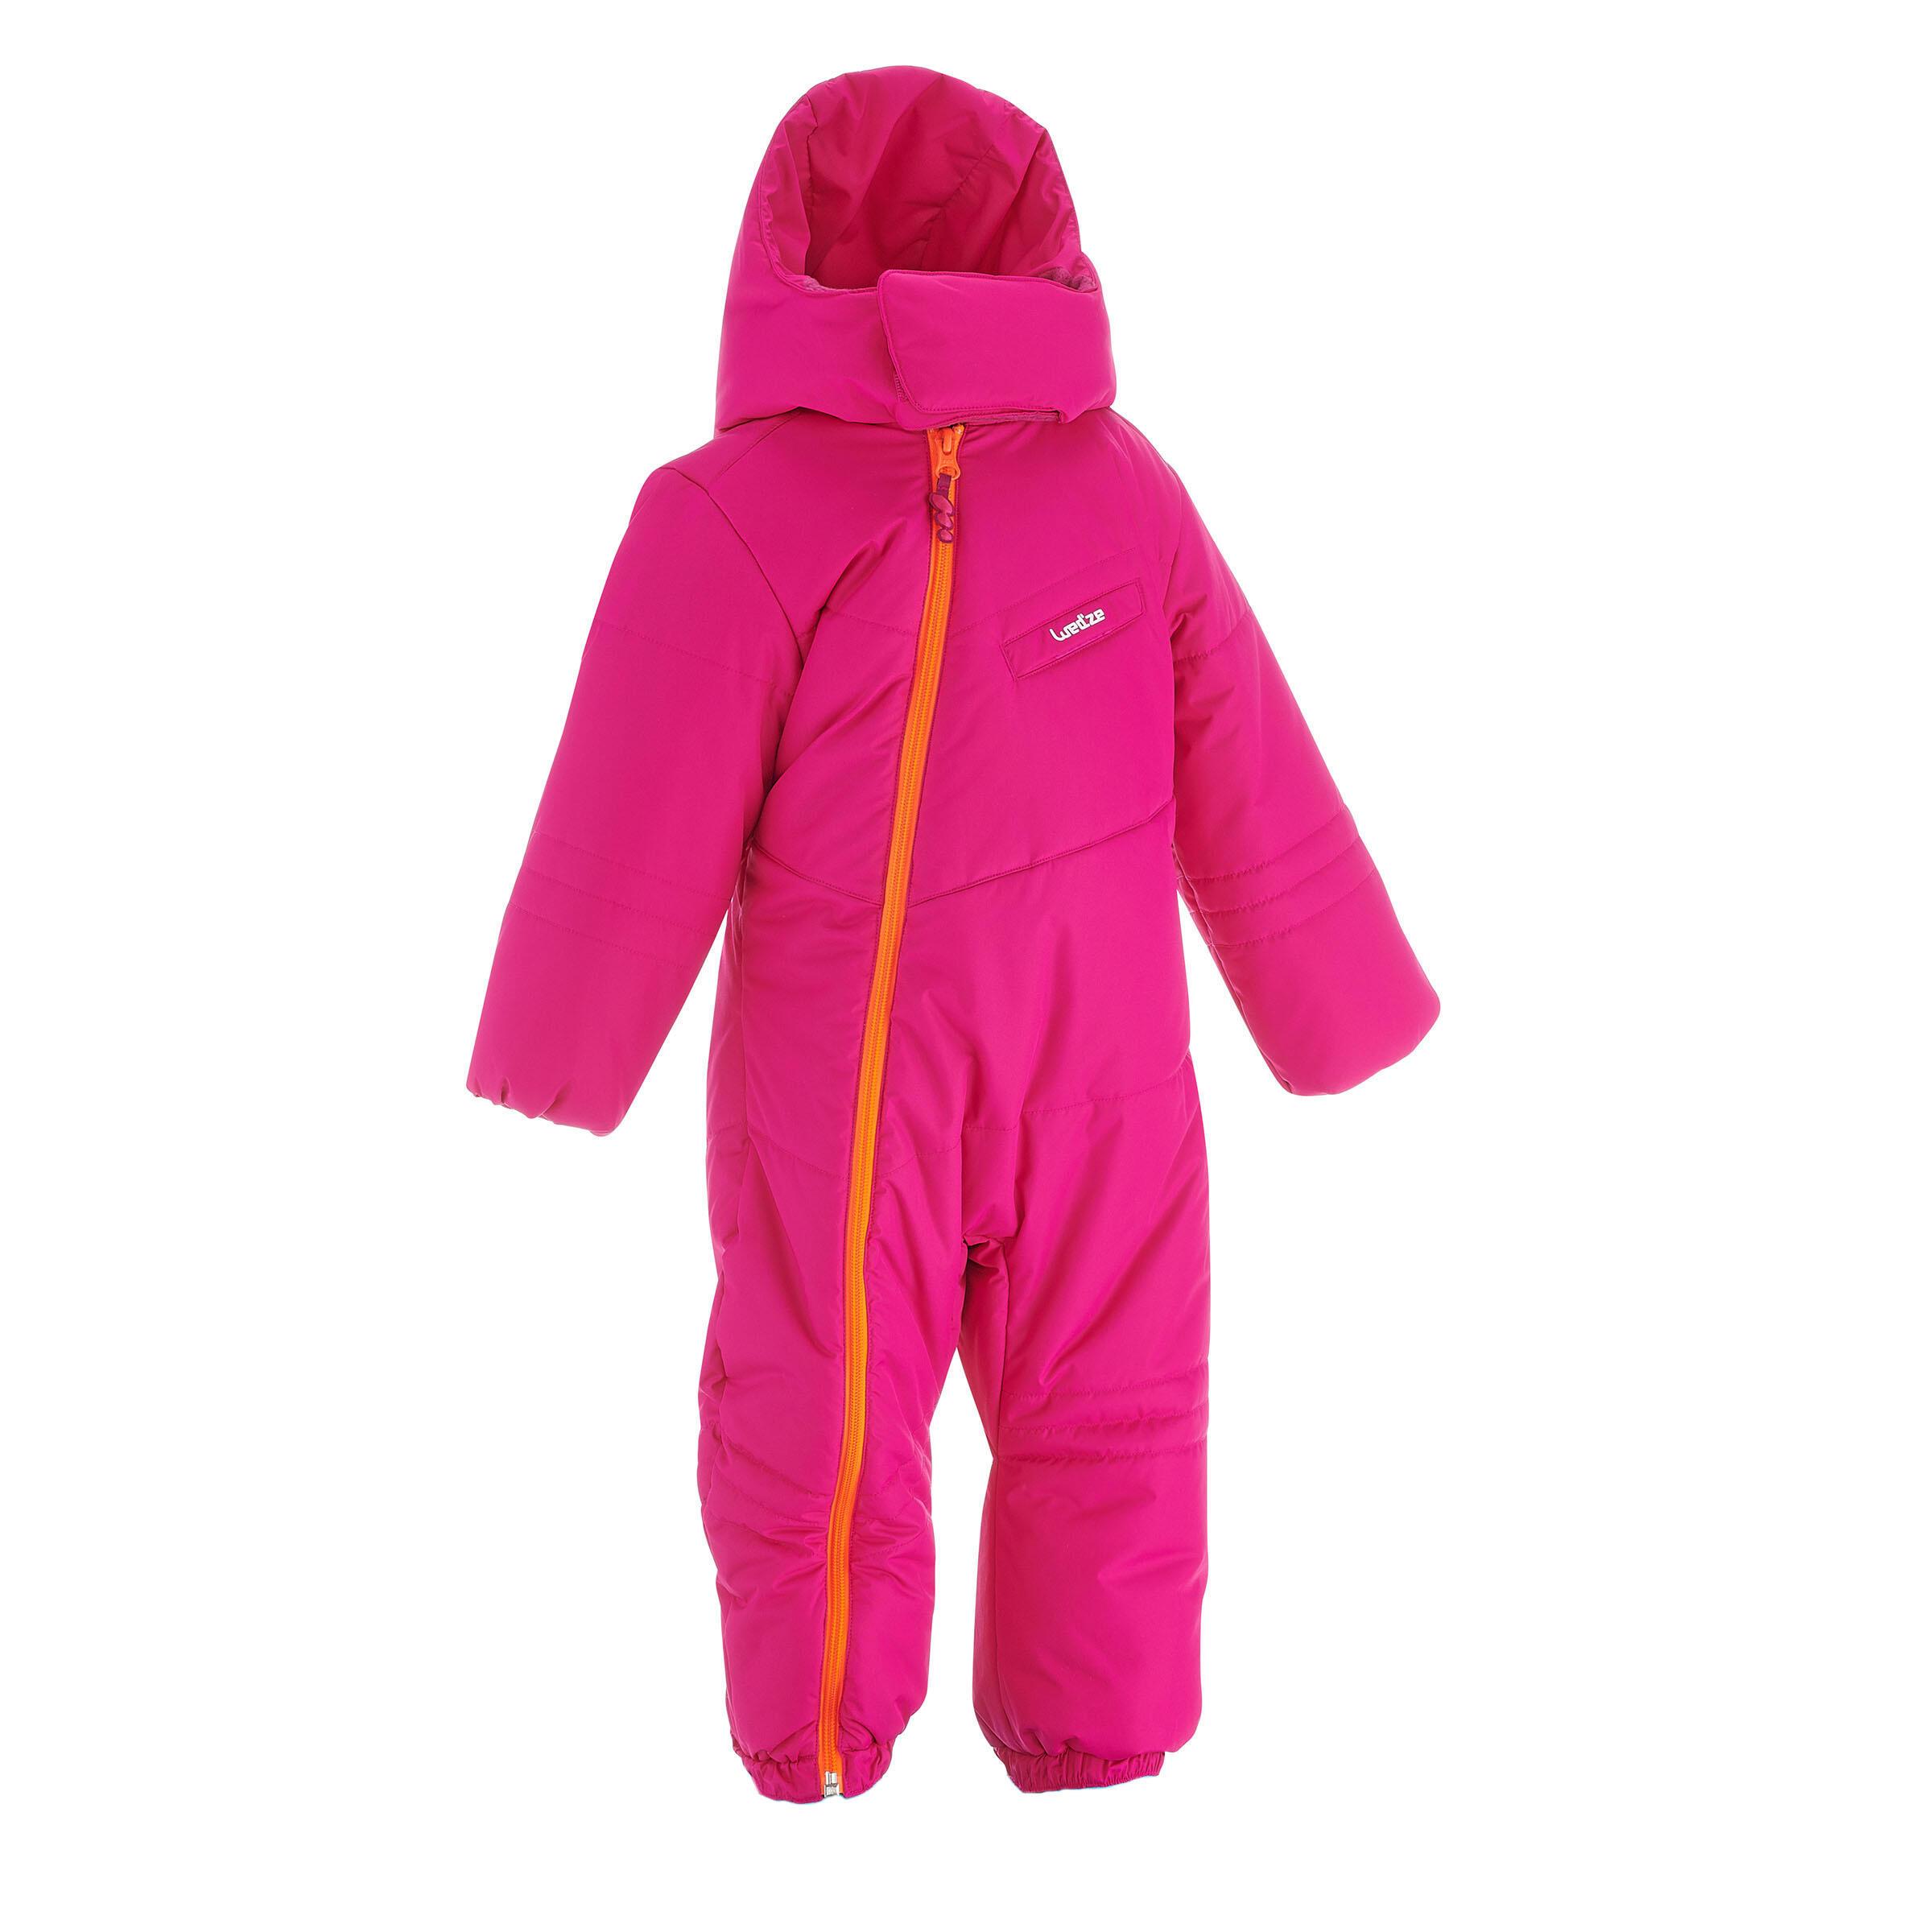 64e1b4e28 Comprar Ropa de Nieve para Bebés online